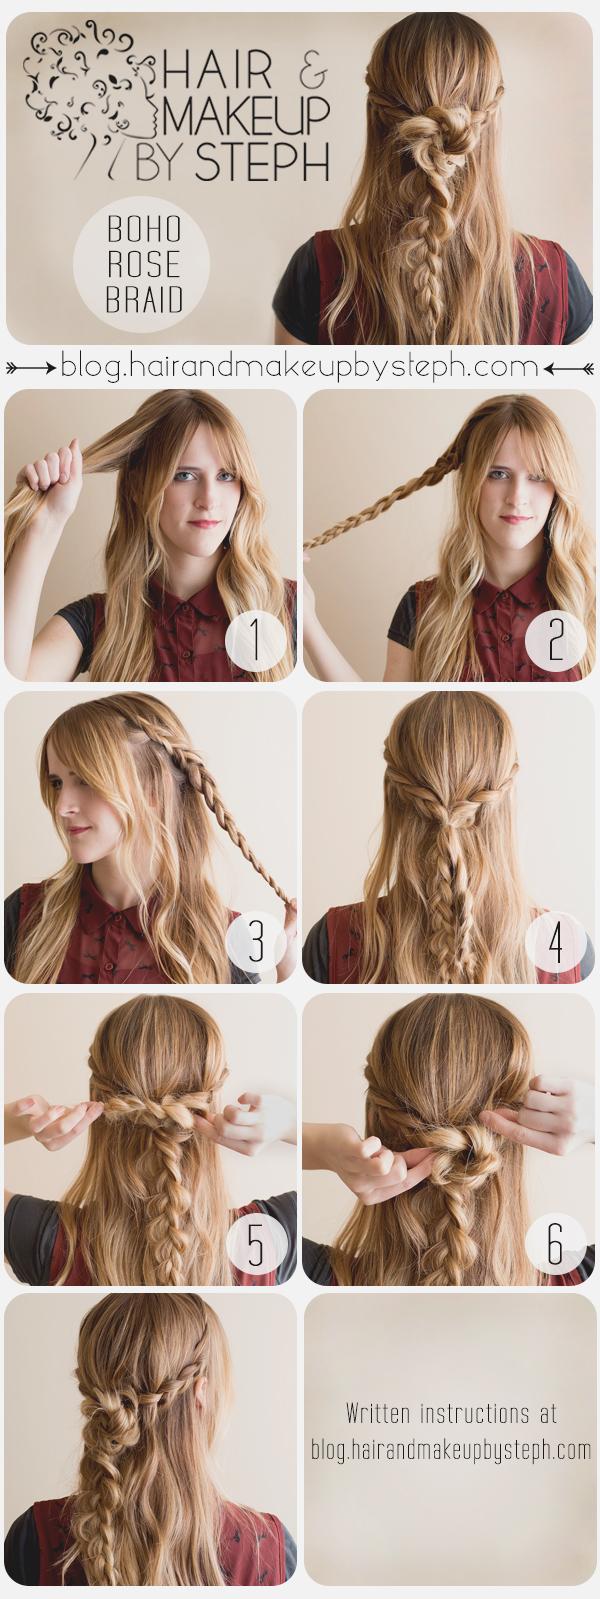 Swell How To Make A Boho Braid Boho Braided Hair Tutorials You Must Short Hairstyles For Black Women Fulllsitofus